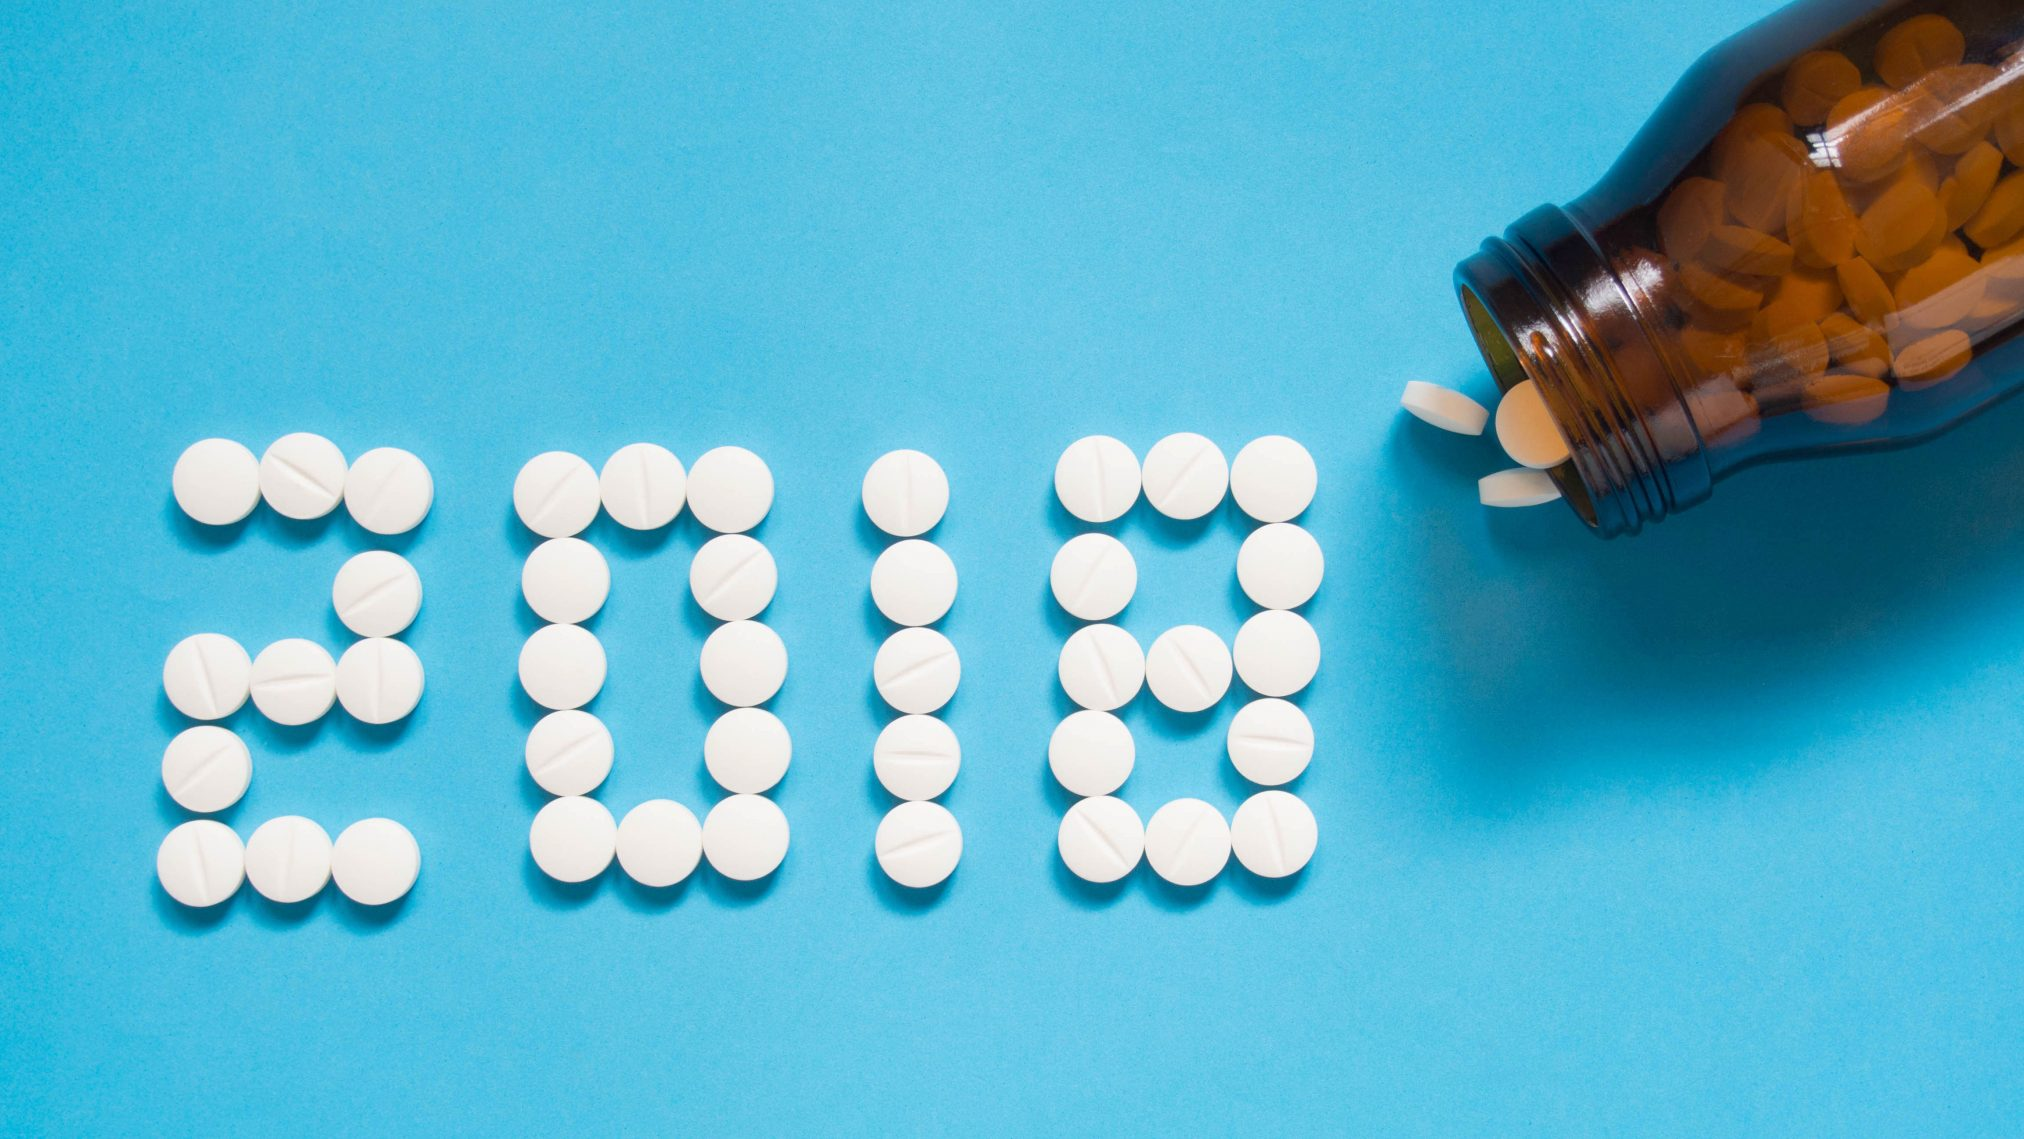 medicines 2018 statistics number